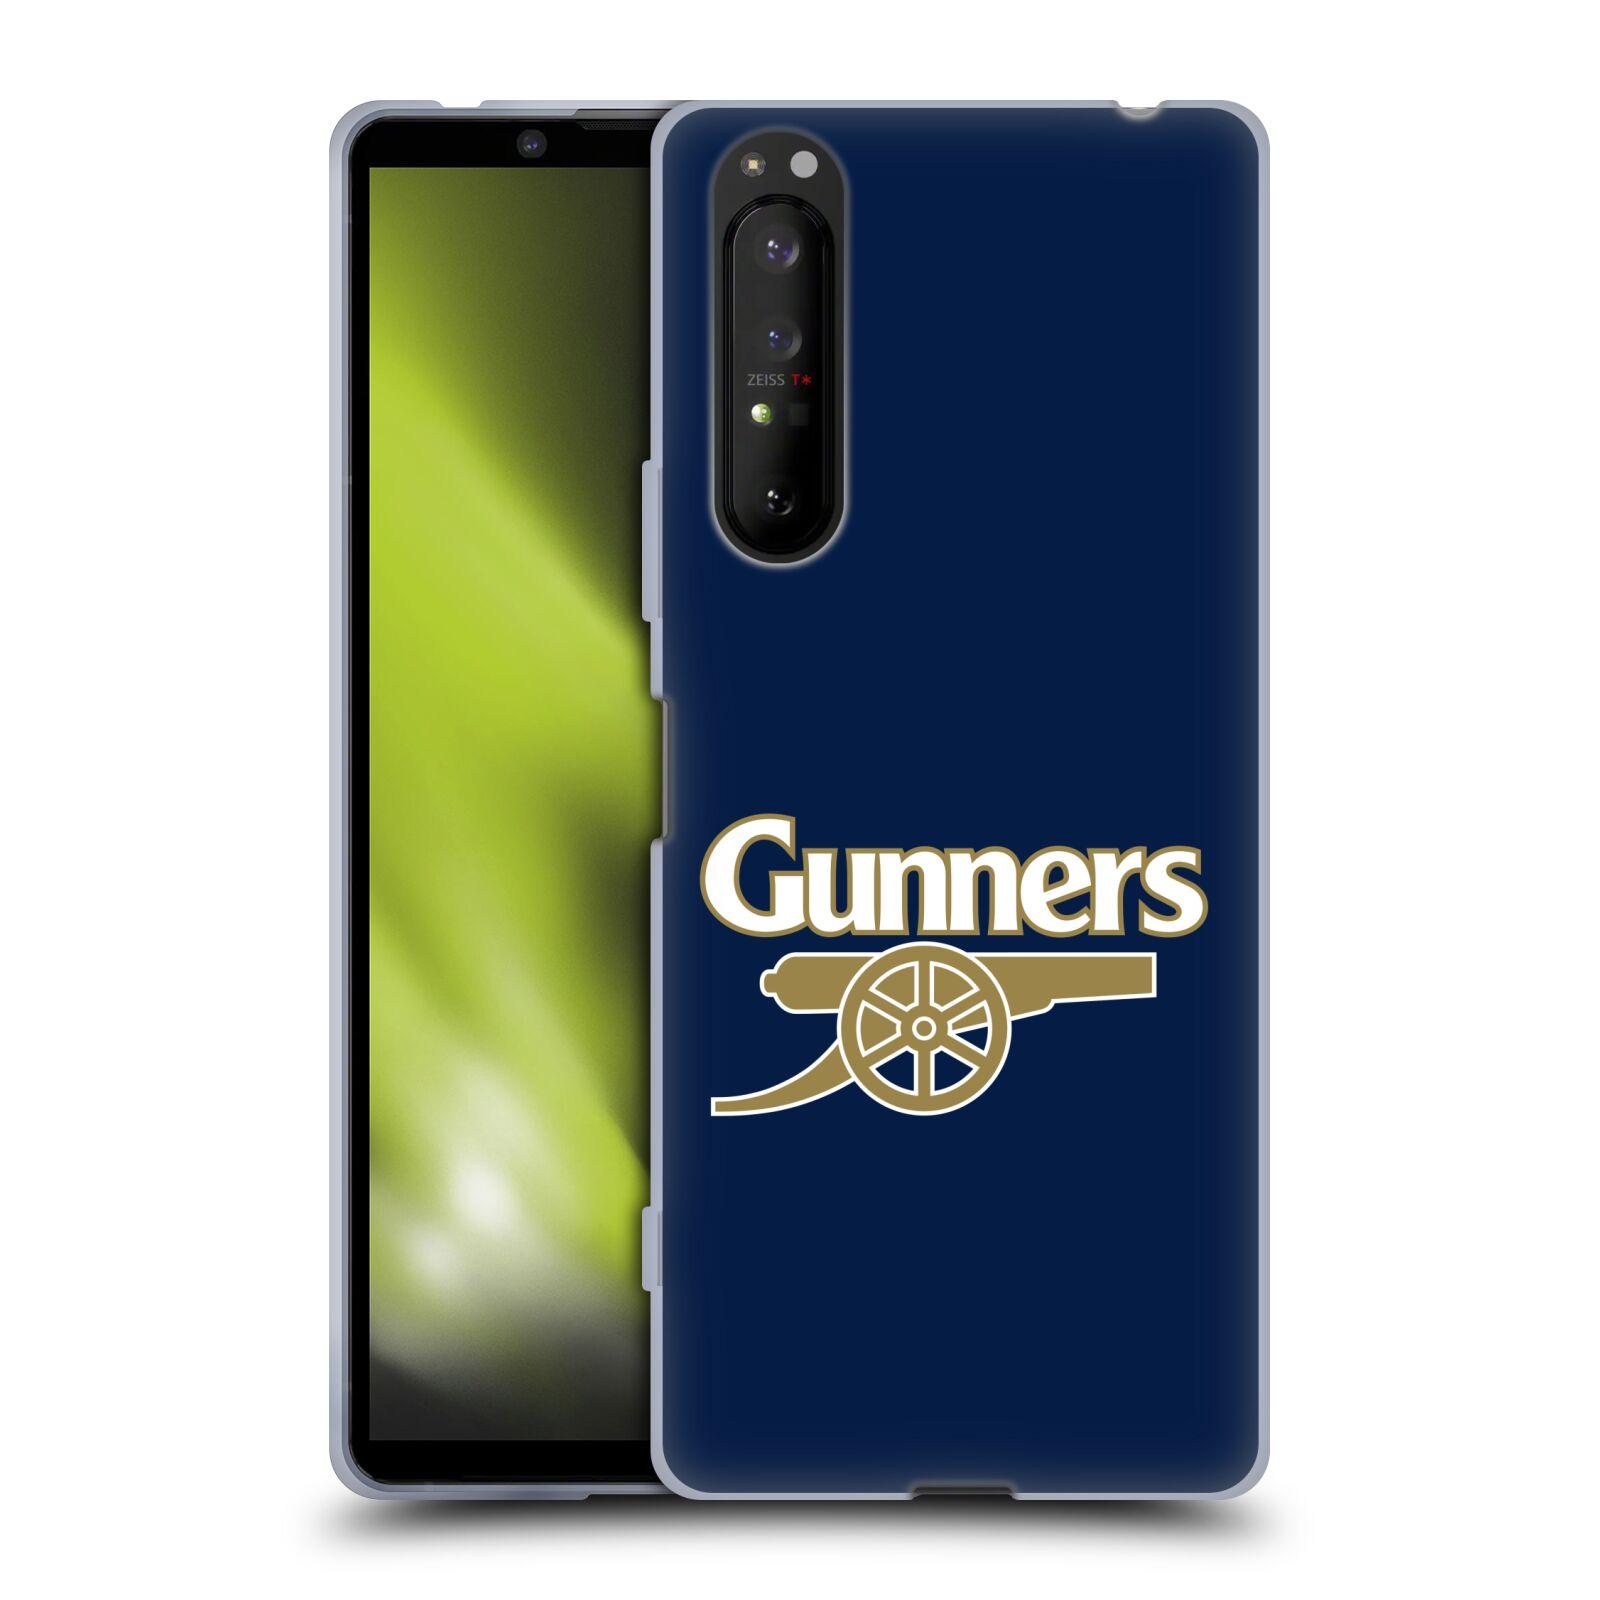 Silikonové pouzdro na mobil Sony Xperia 1 II - Head Case - Arsenal FC - Gunners